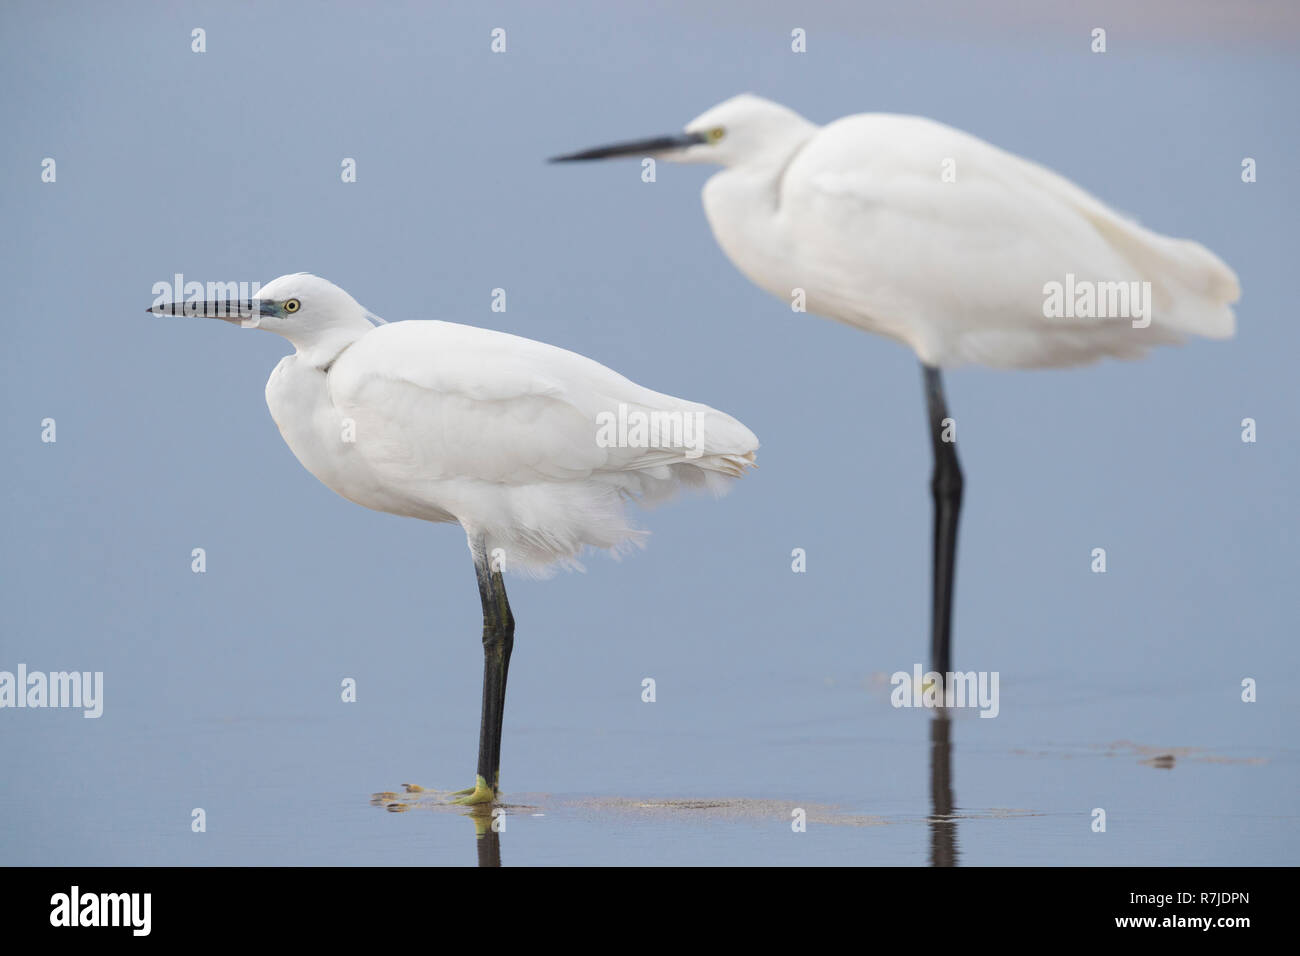 Little Egret (Egretta garzetta), two individuals standing on the shore - Stock Image